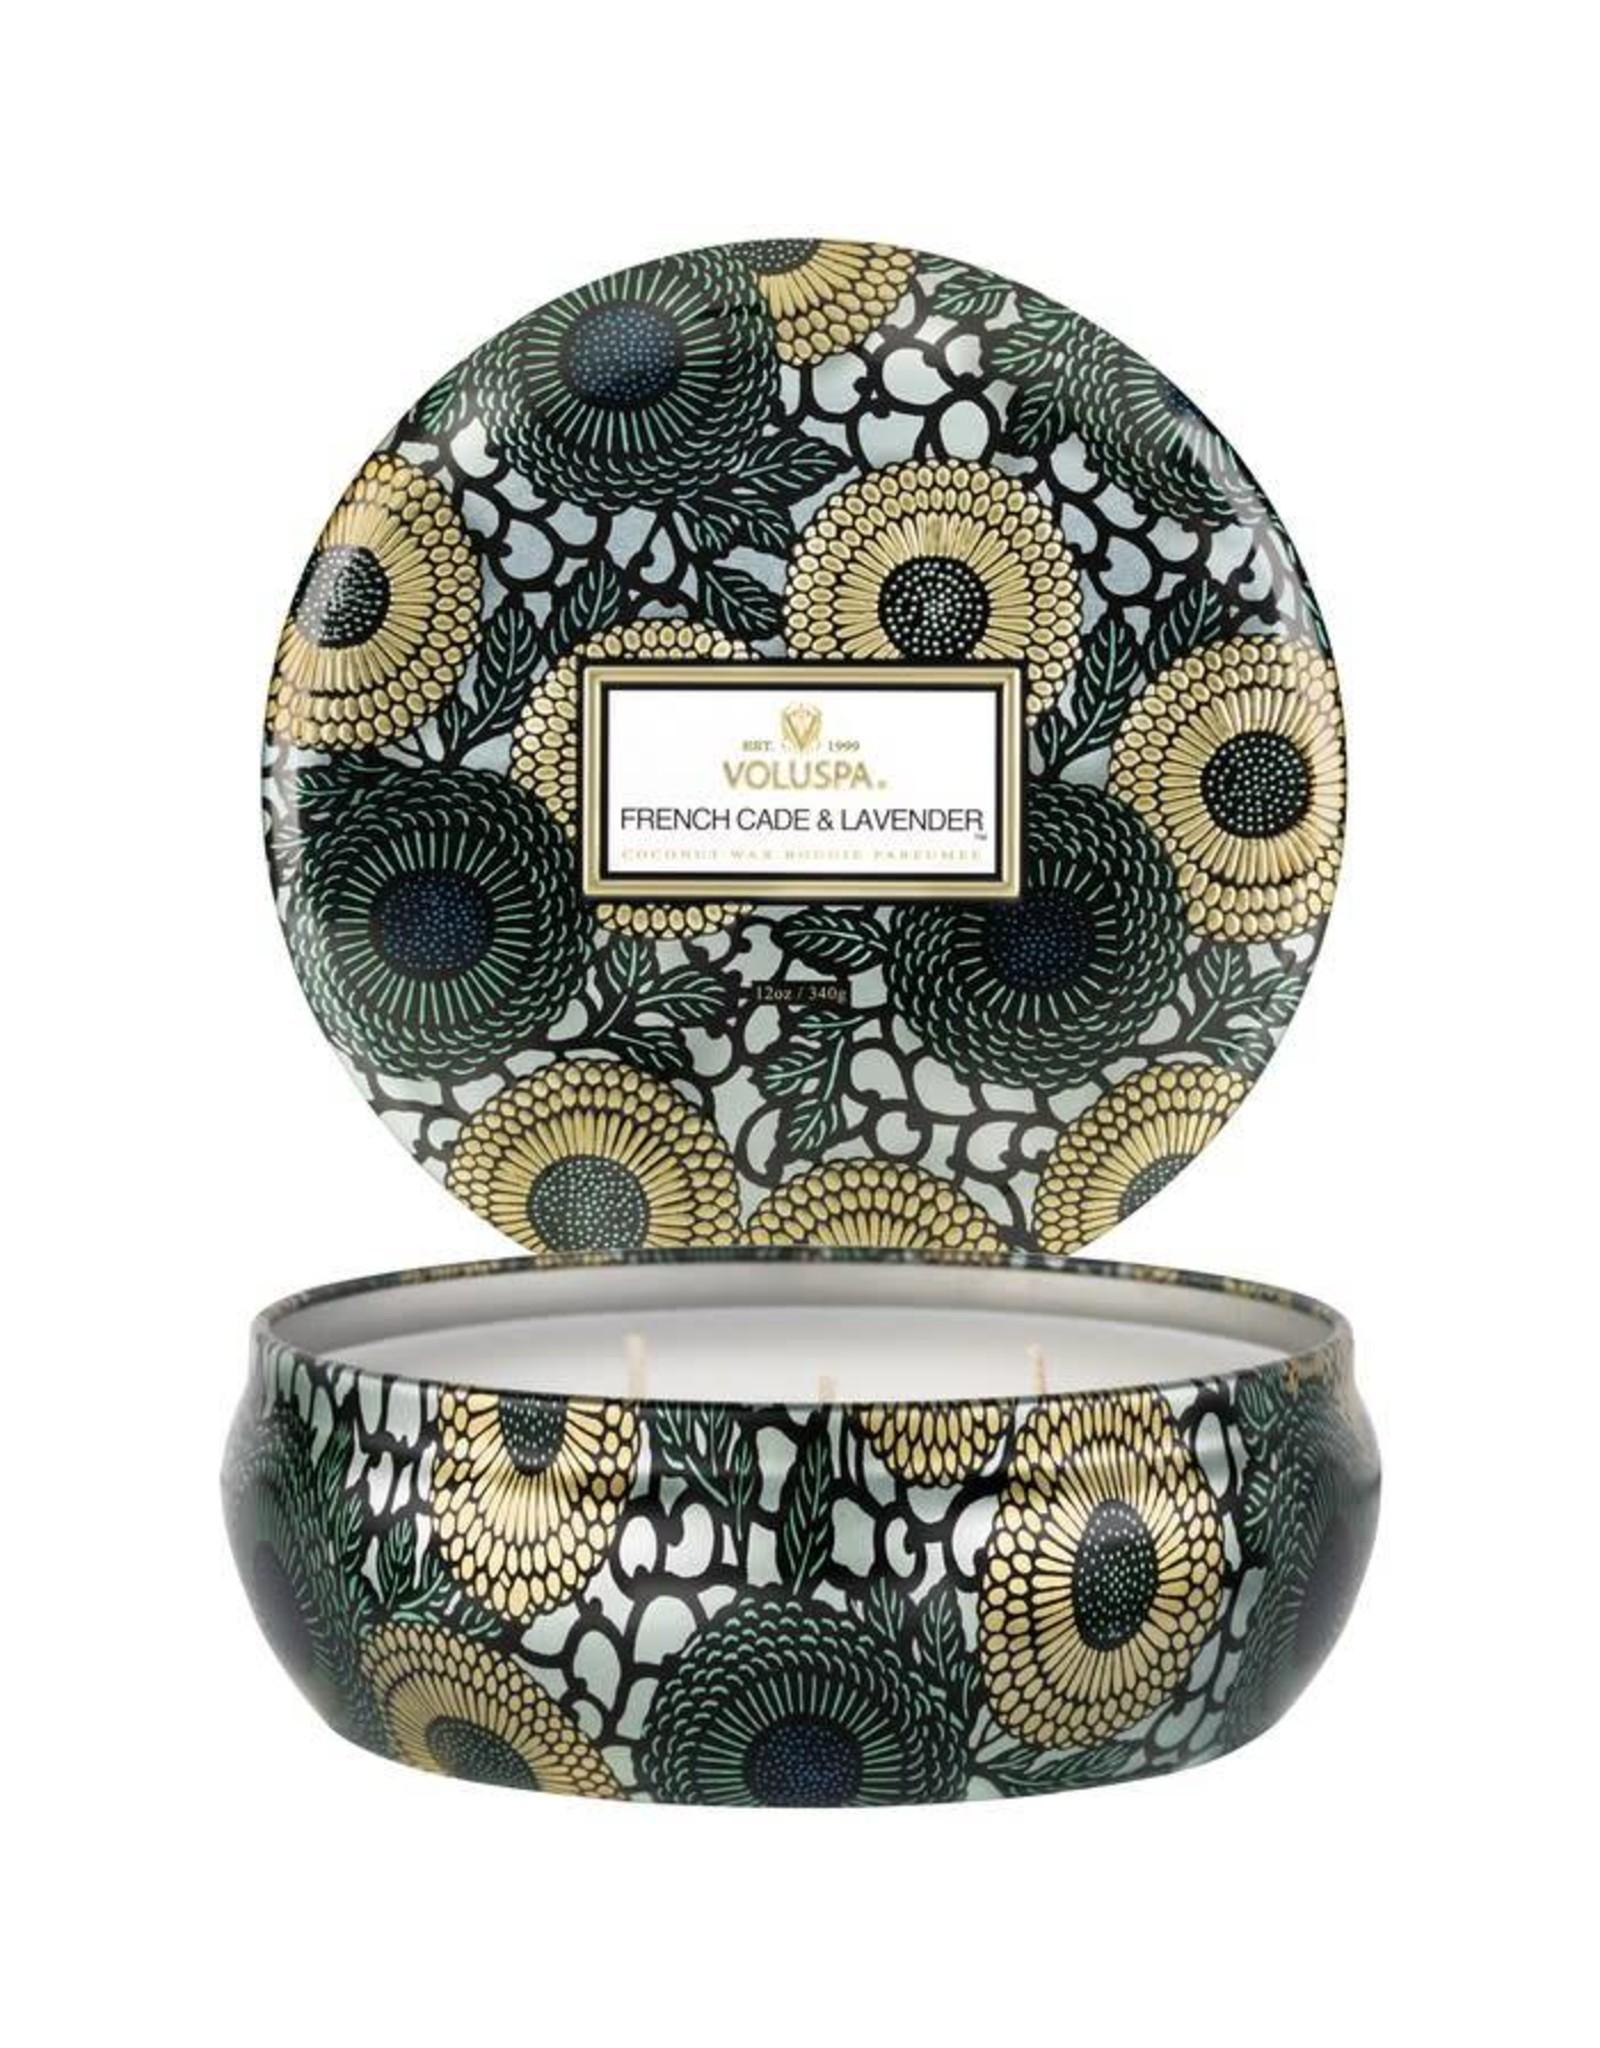 Voluspa French Cade & Lavender Voluspa Candle